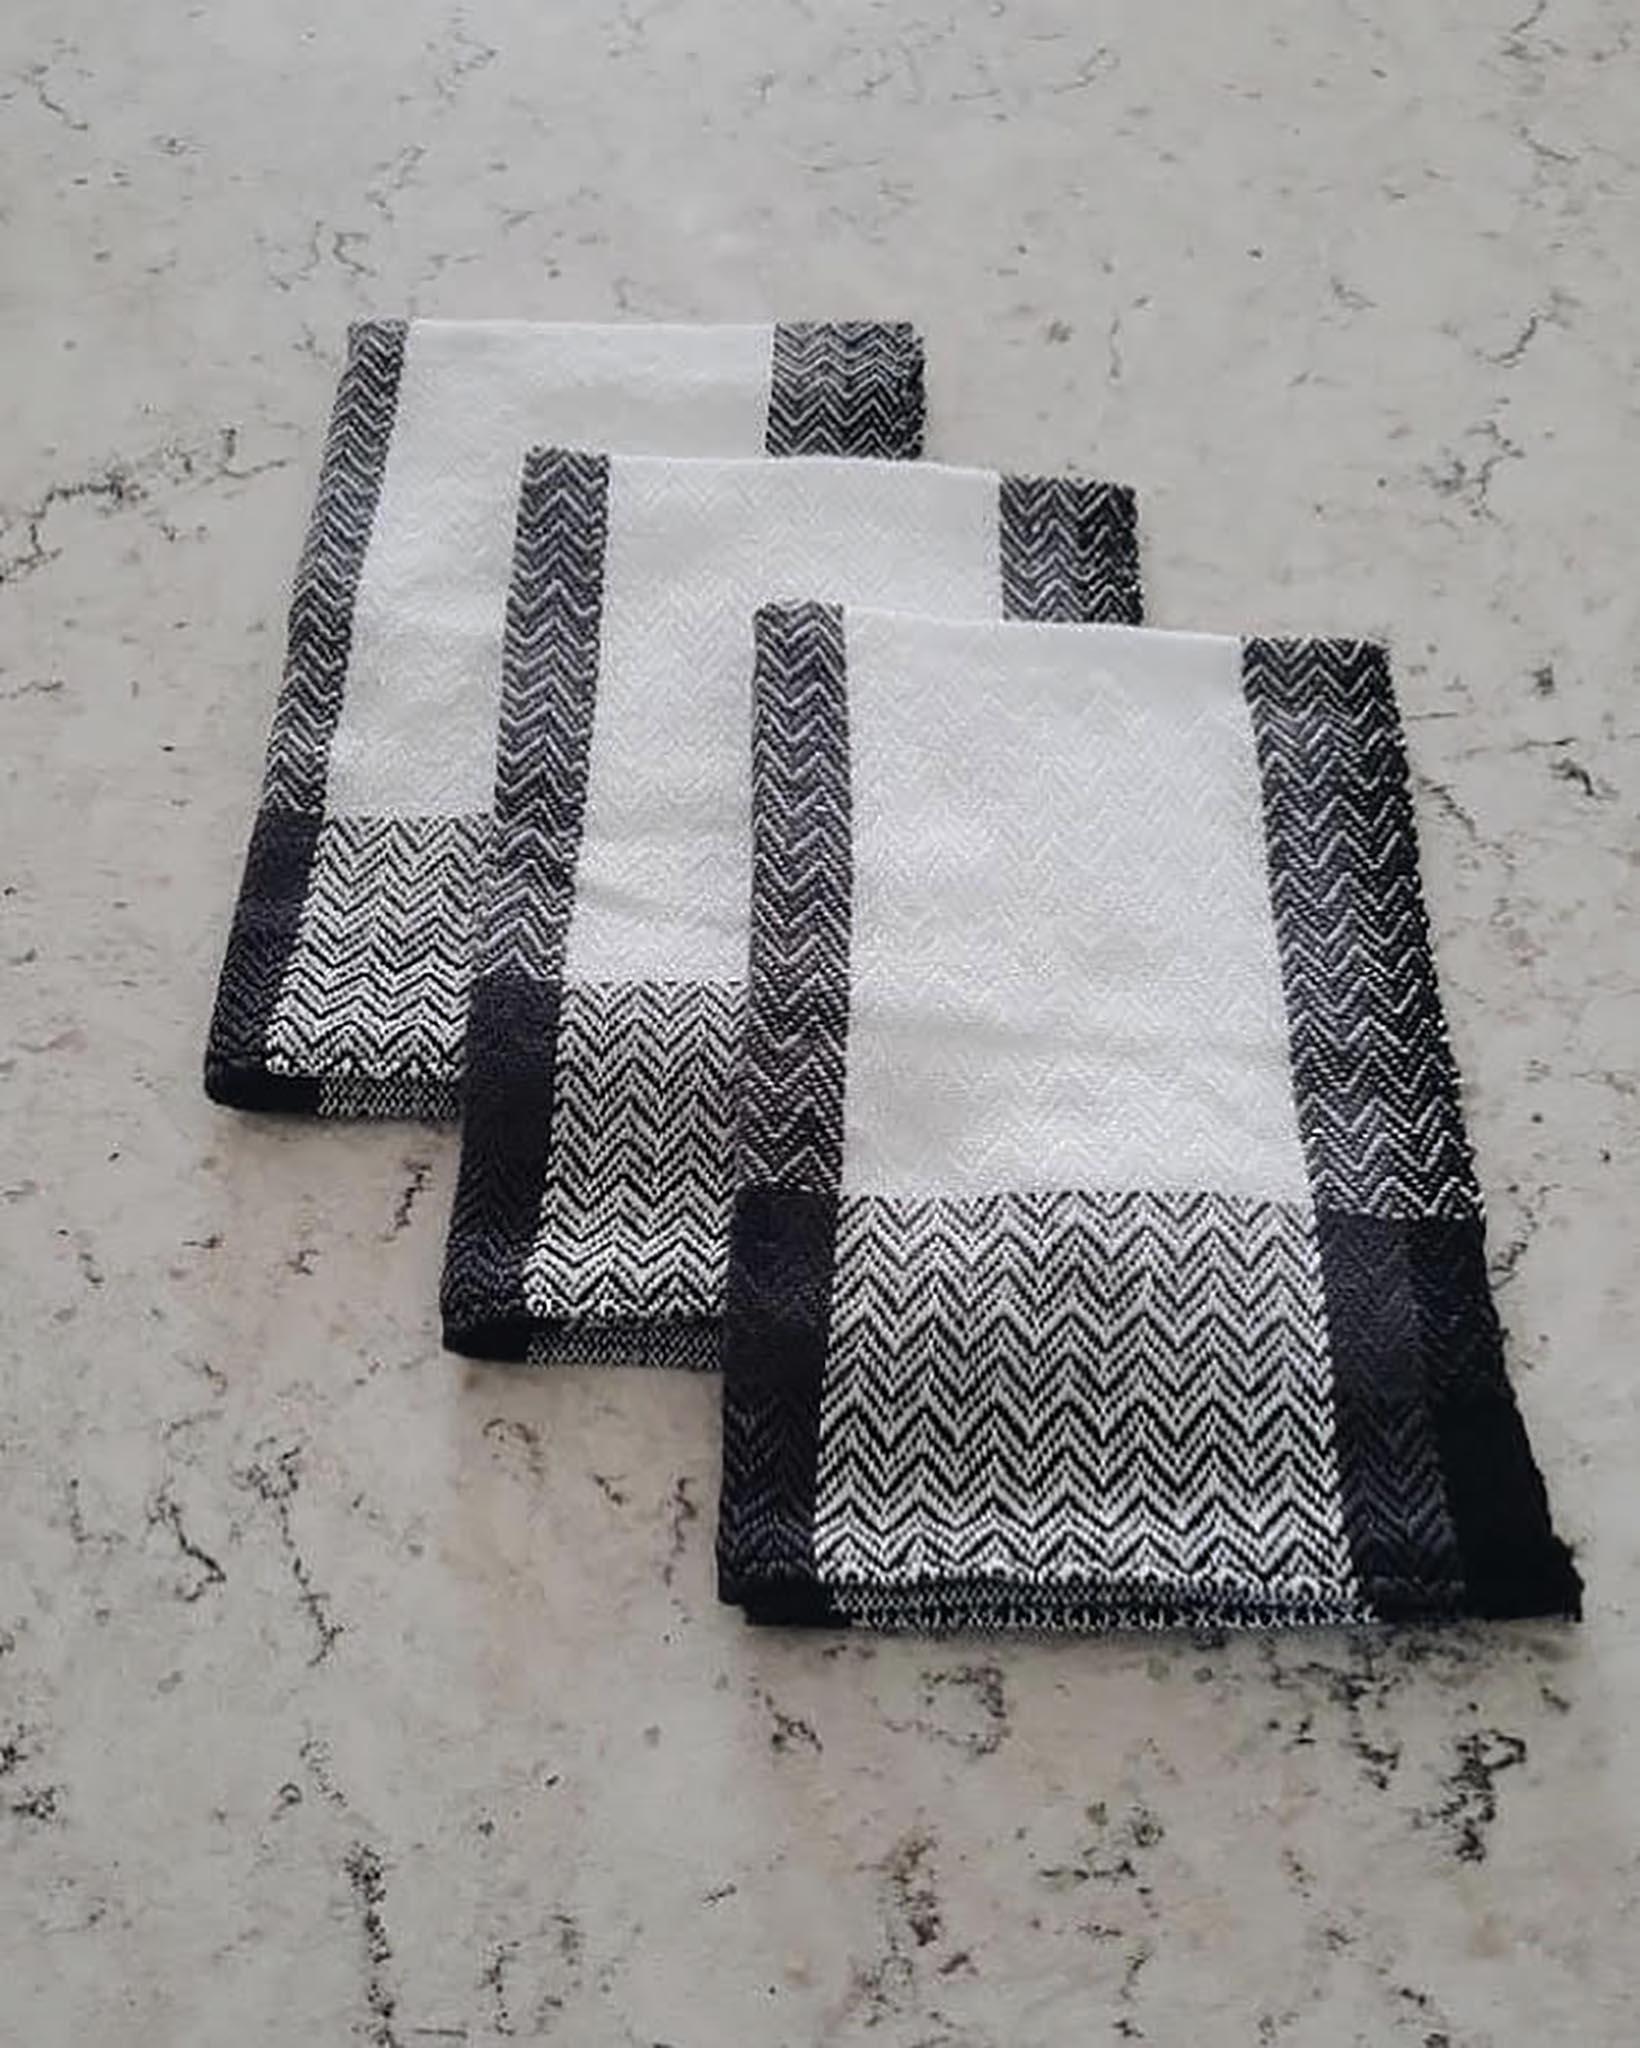 Weaving Inspiration Gist Yarn and Fiber